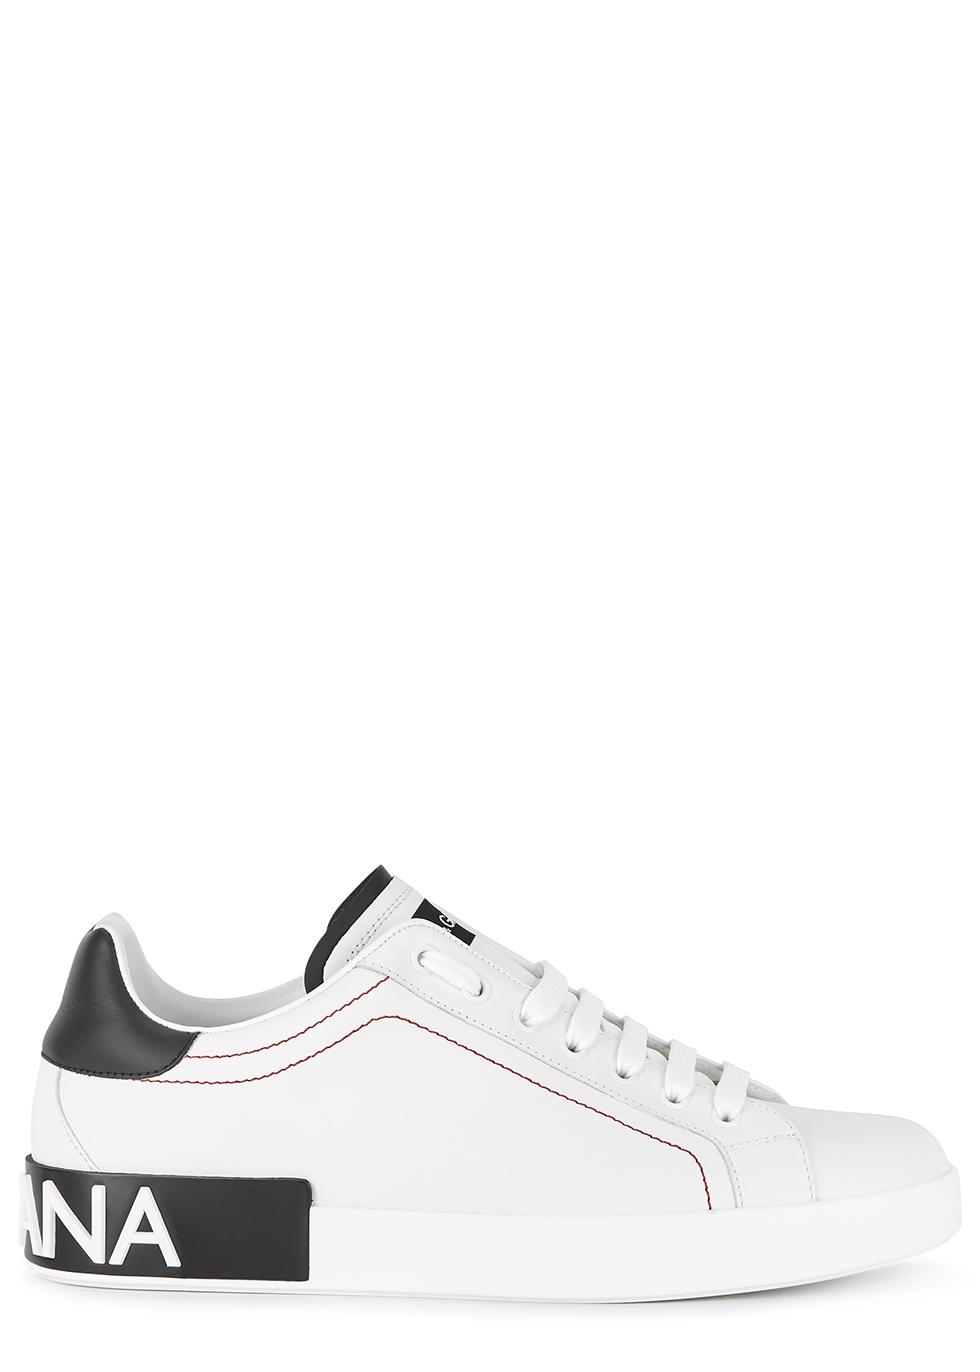 Portofino white leather sneakers